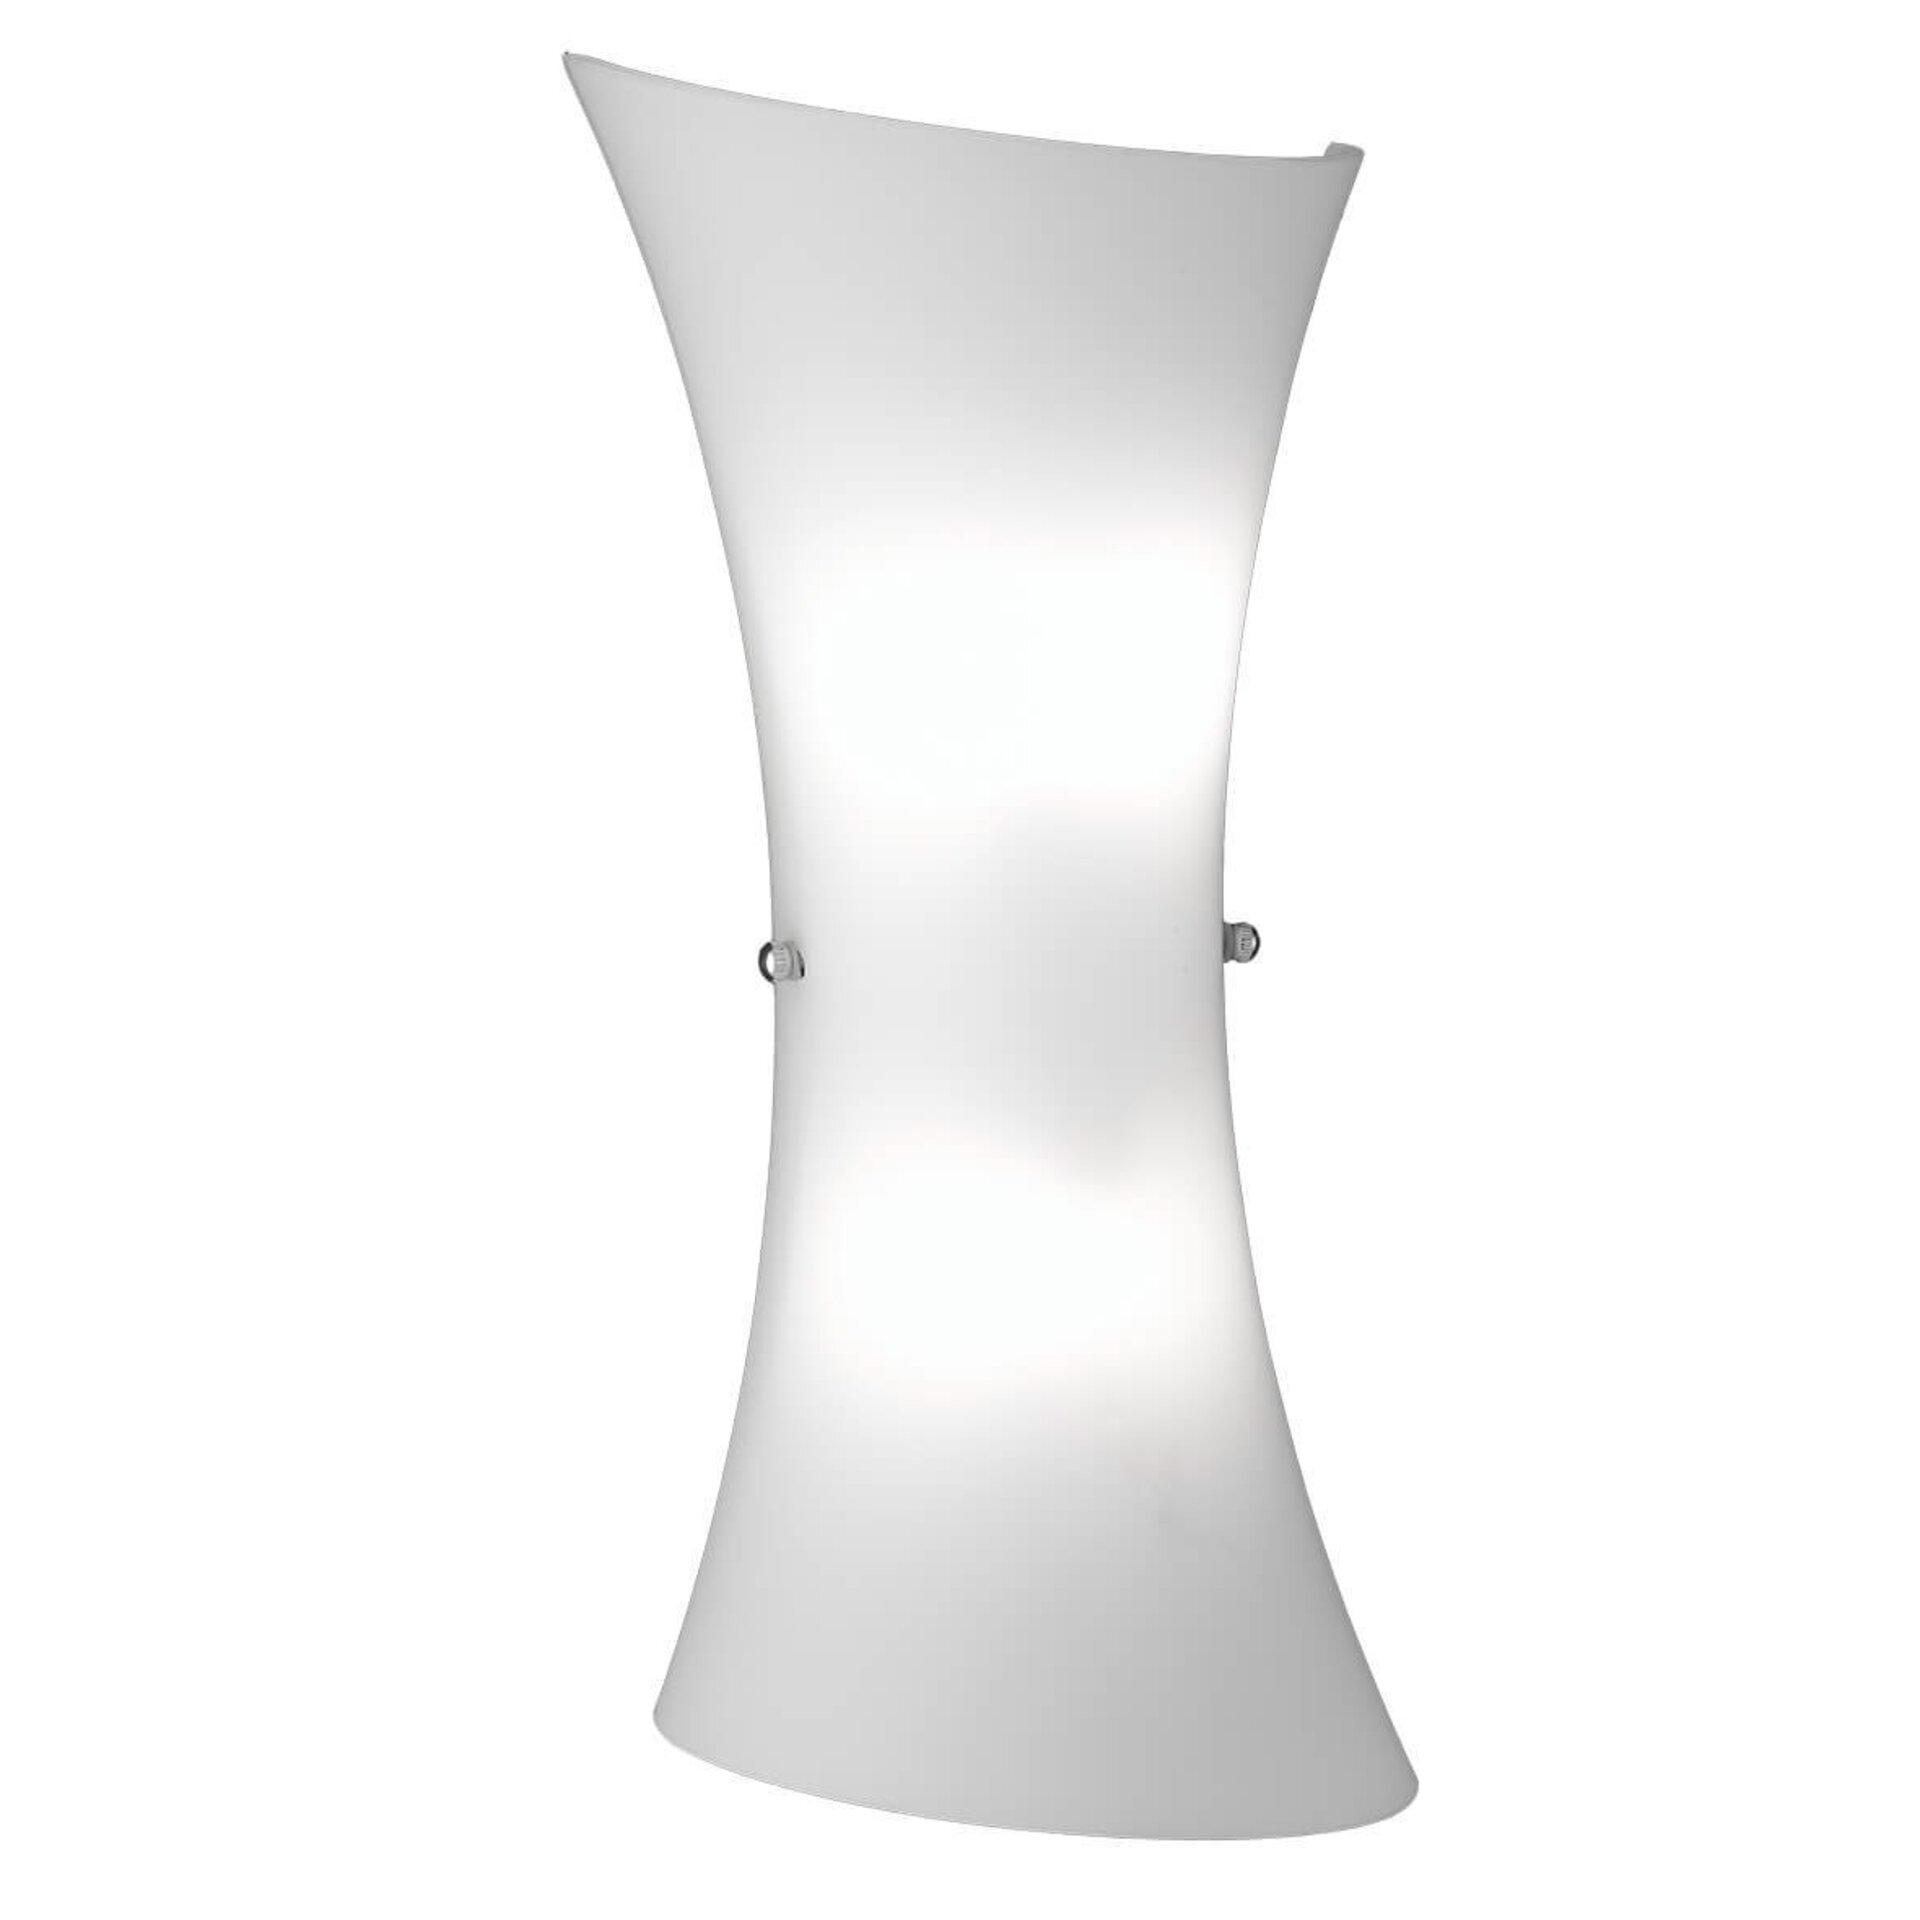 Wandleuchte Zibo Wofi Leuchten Glas 8 x 35 x 16 cm